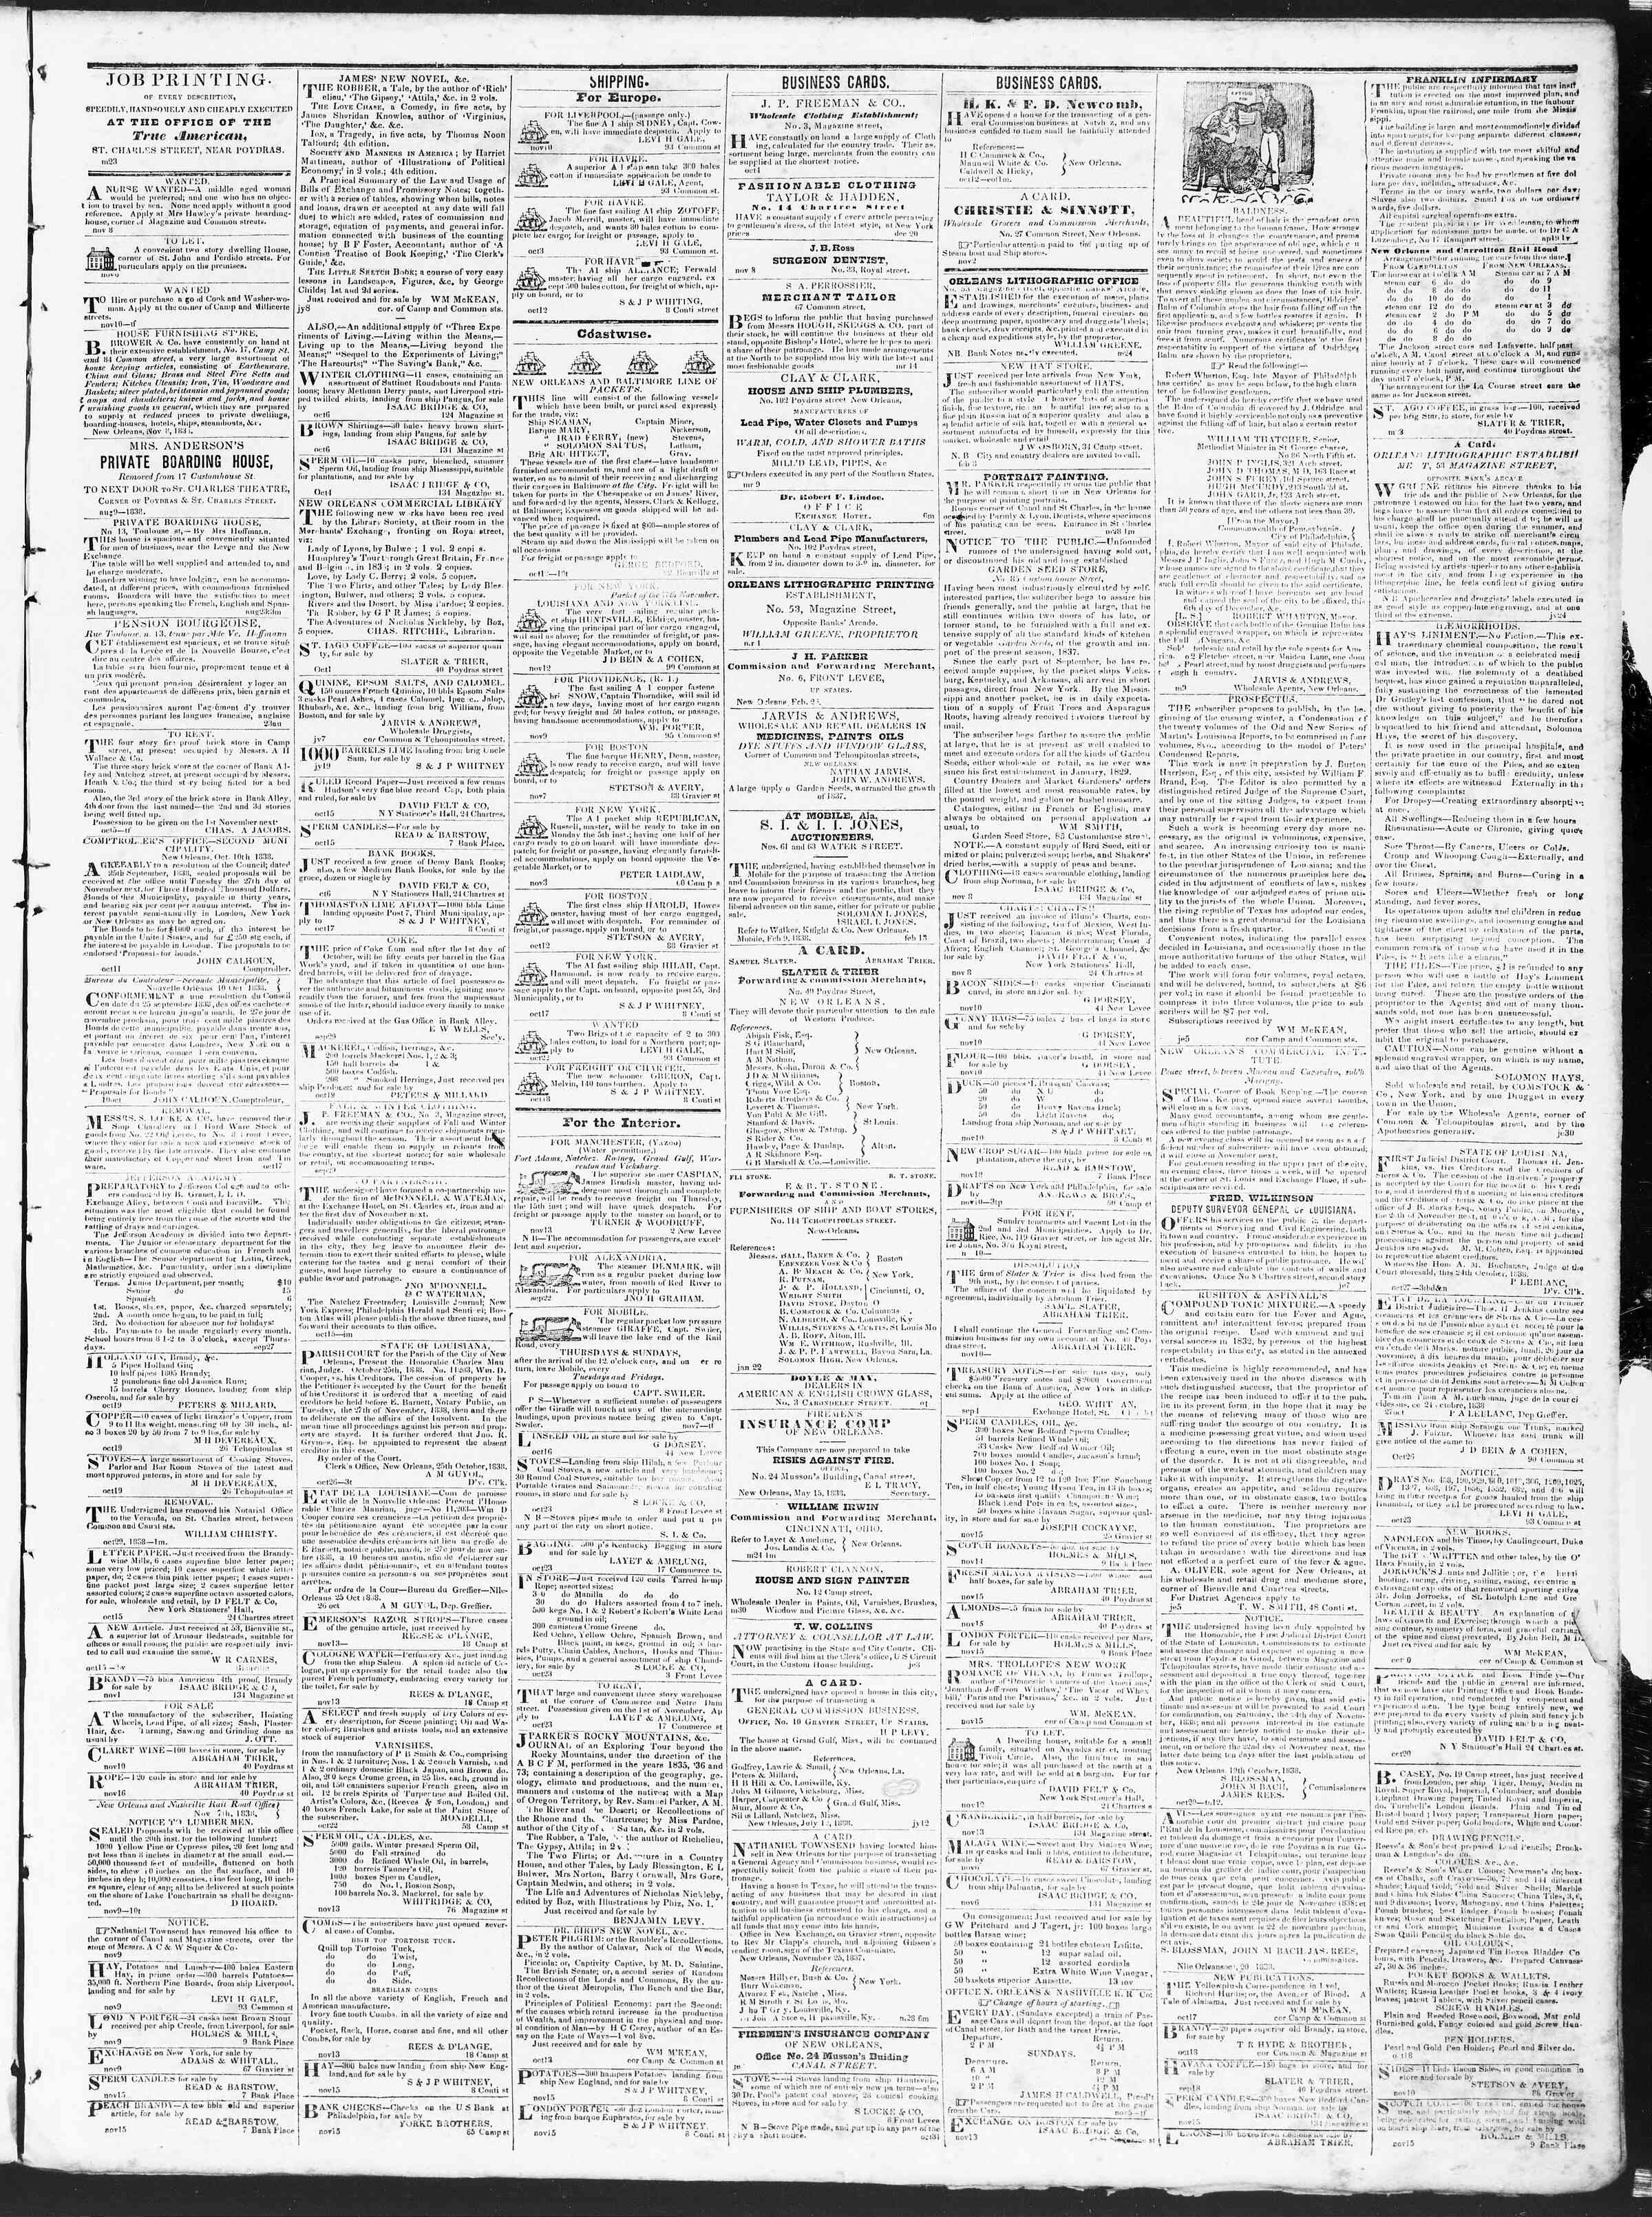 November 16, 1838 Tarihli True American Gazetesi Sayfa 3